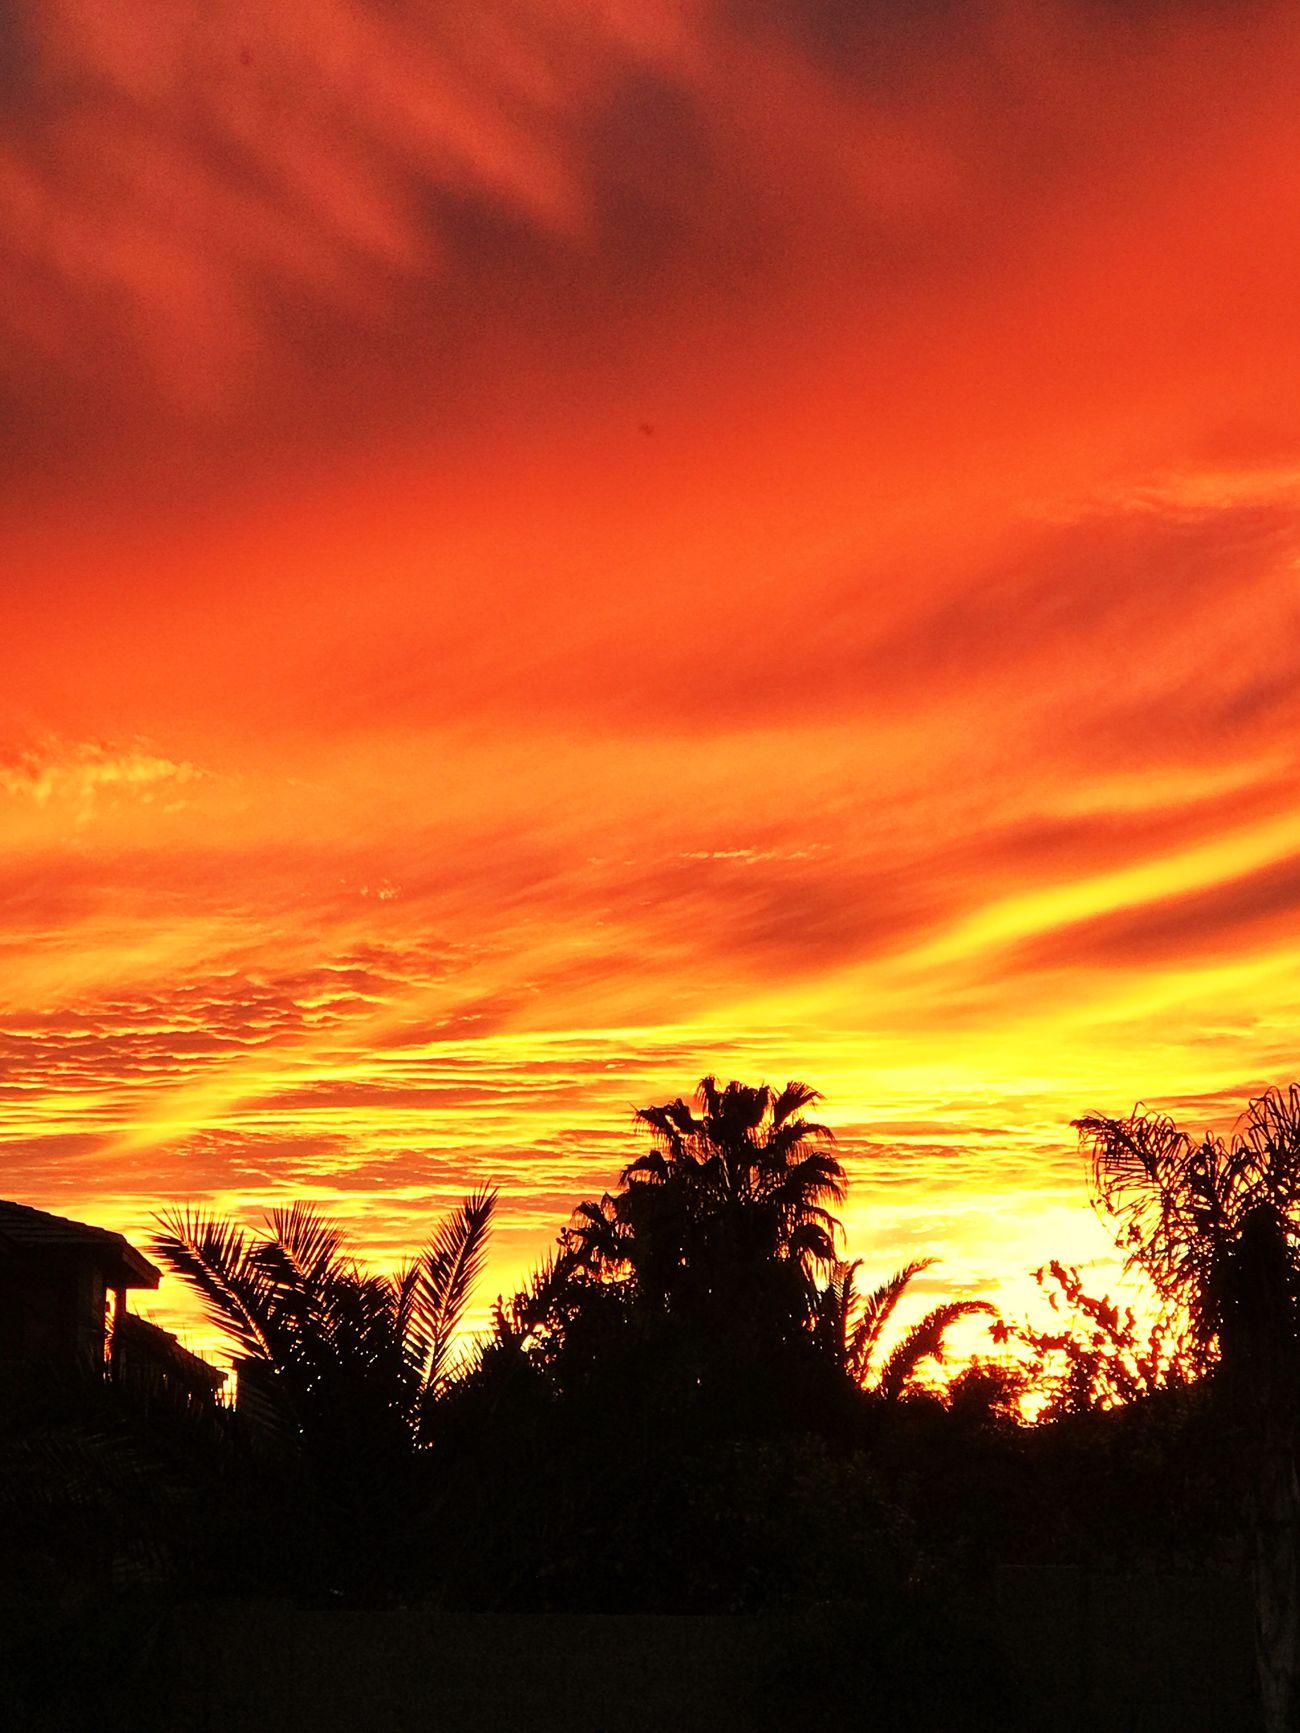 Sunset EyeEmNewHere Orange Sky Clouds Sky Sunstet Arizona Desert Landscape Sunlight Sunshine ☀